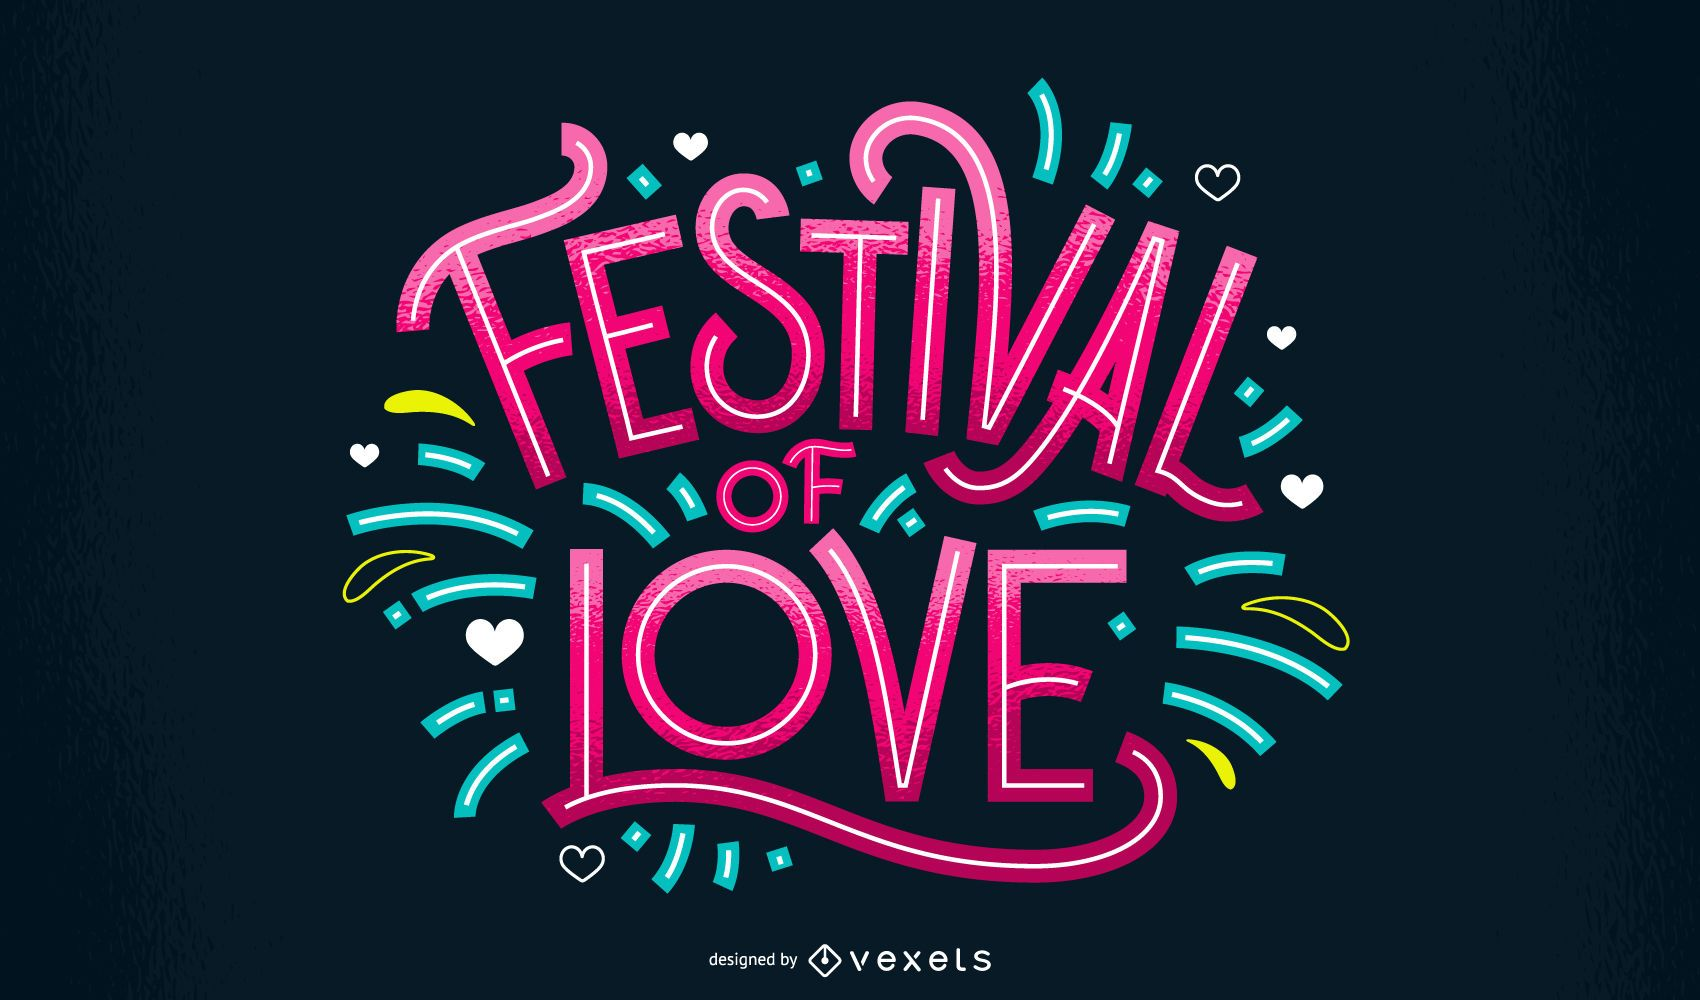 Projeto de letras Holi Love Festival